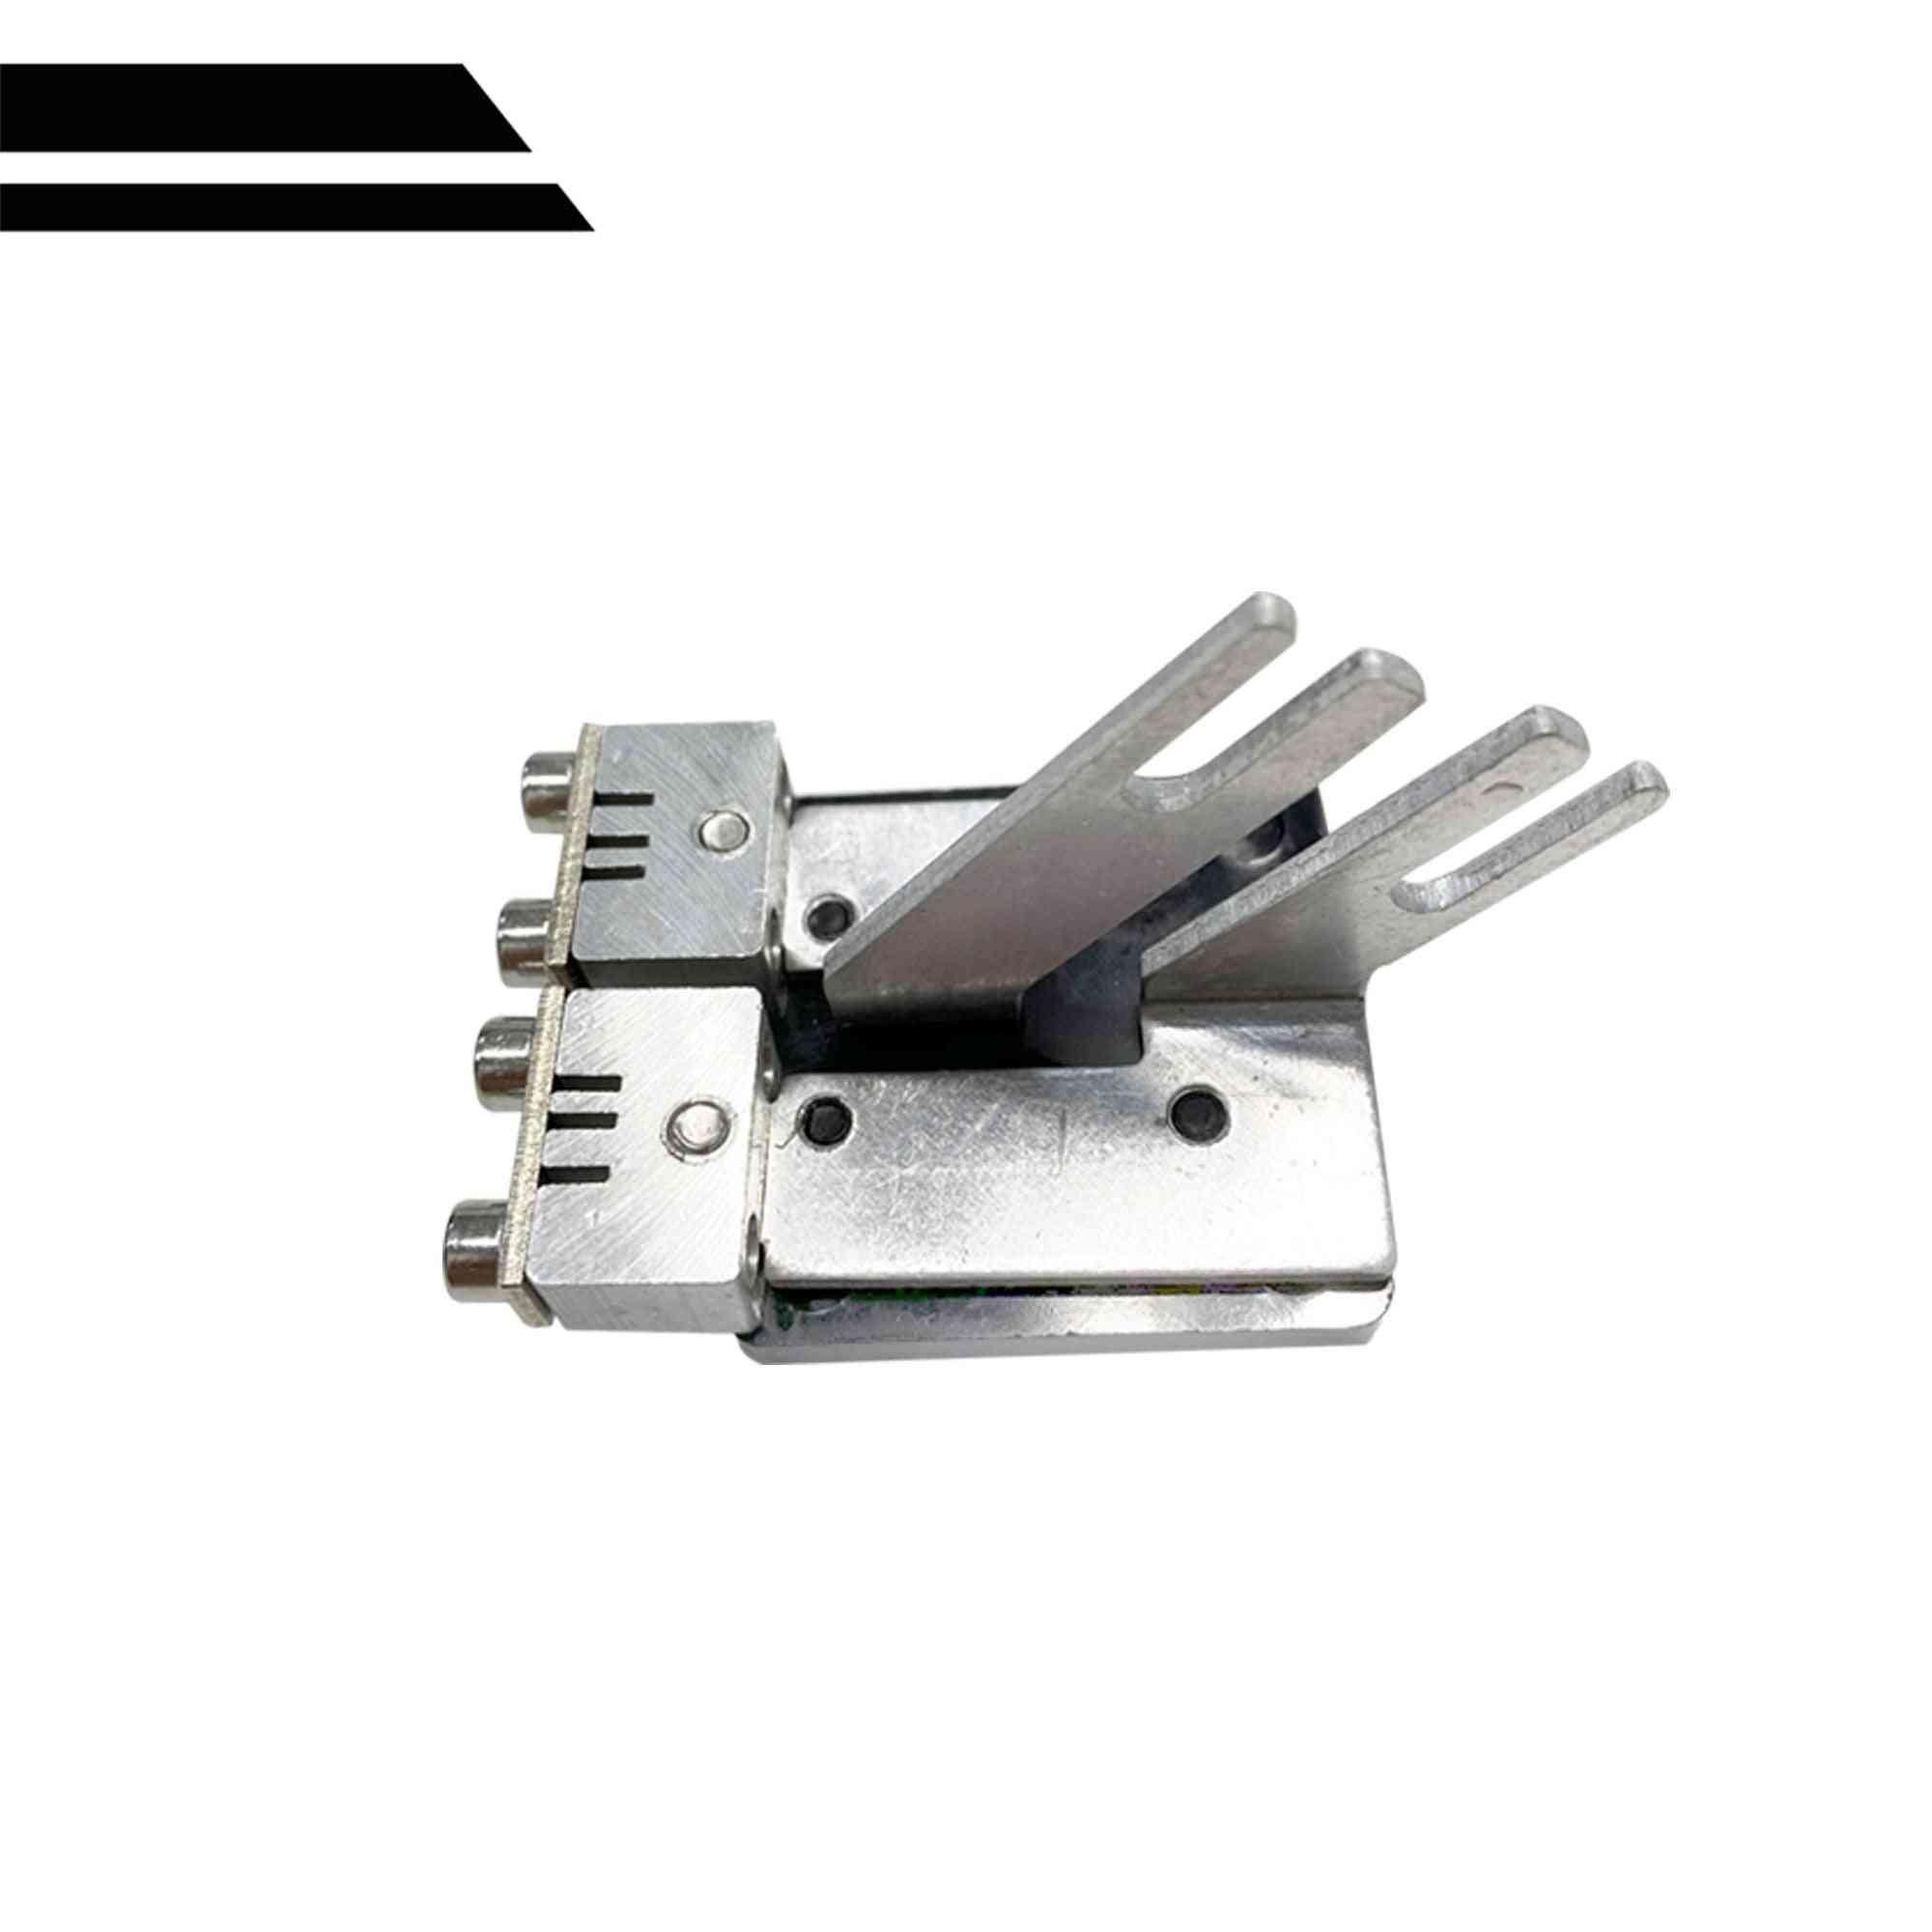 Electric Hot Knife Foam Slotting Tool, Hot Cutting